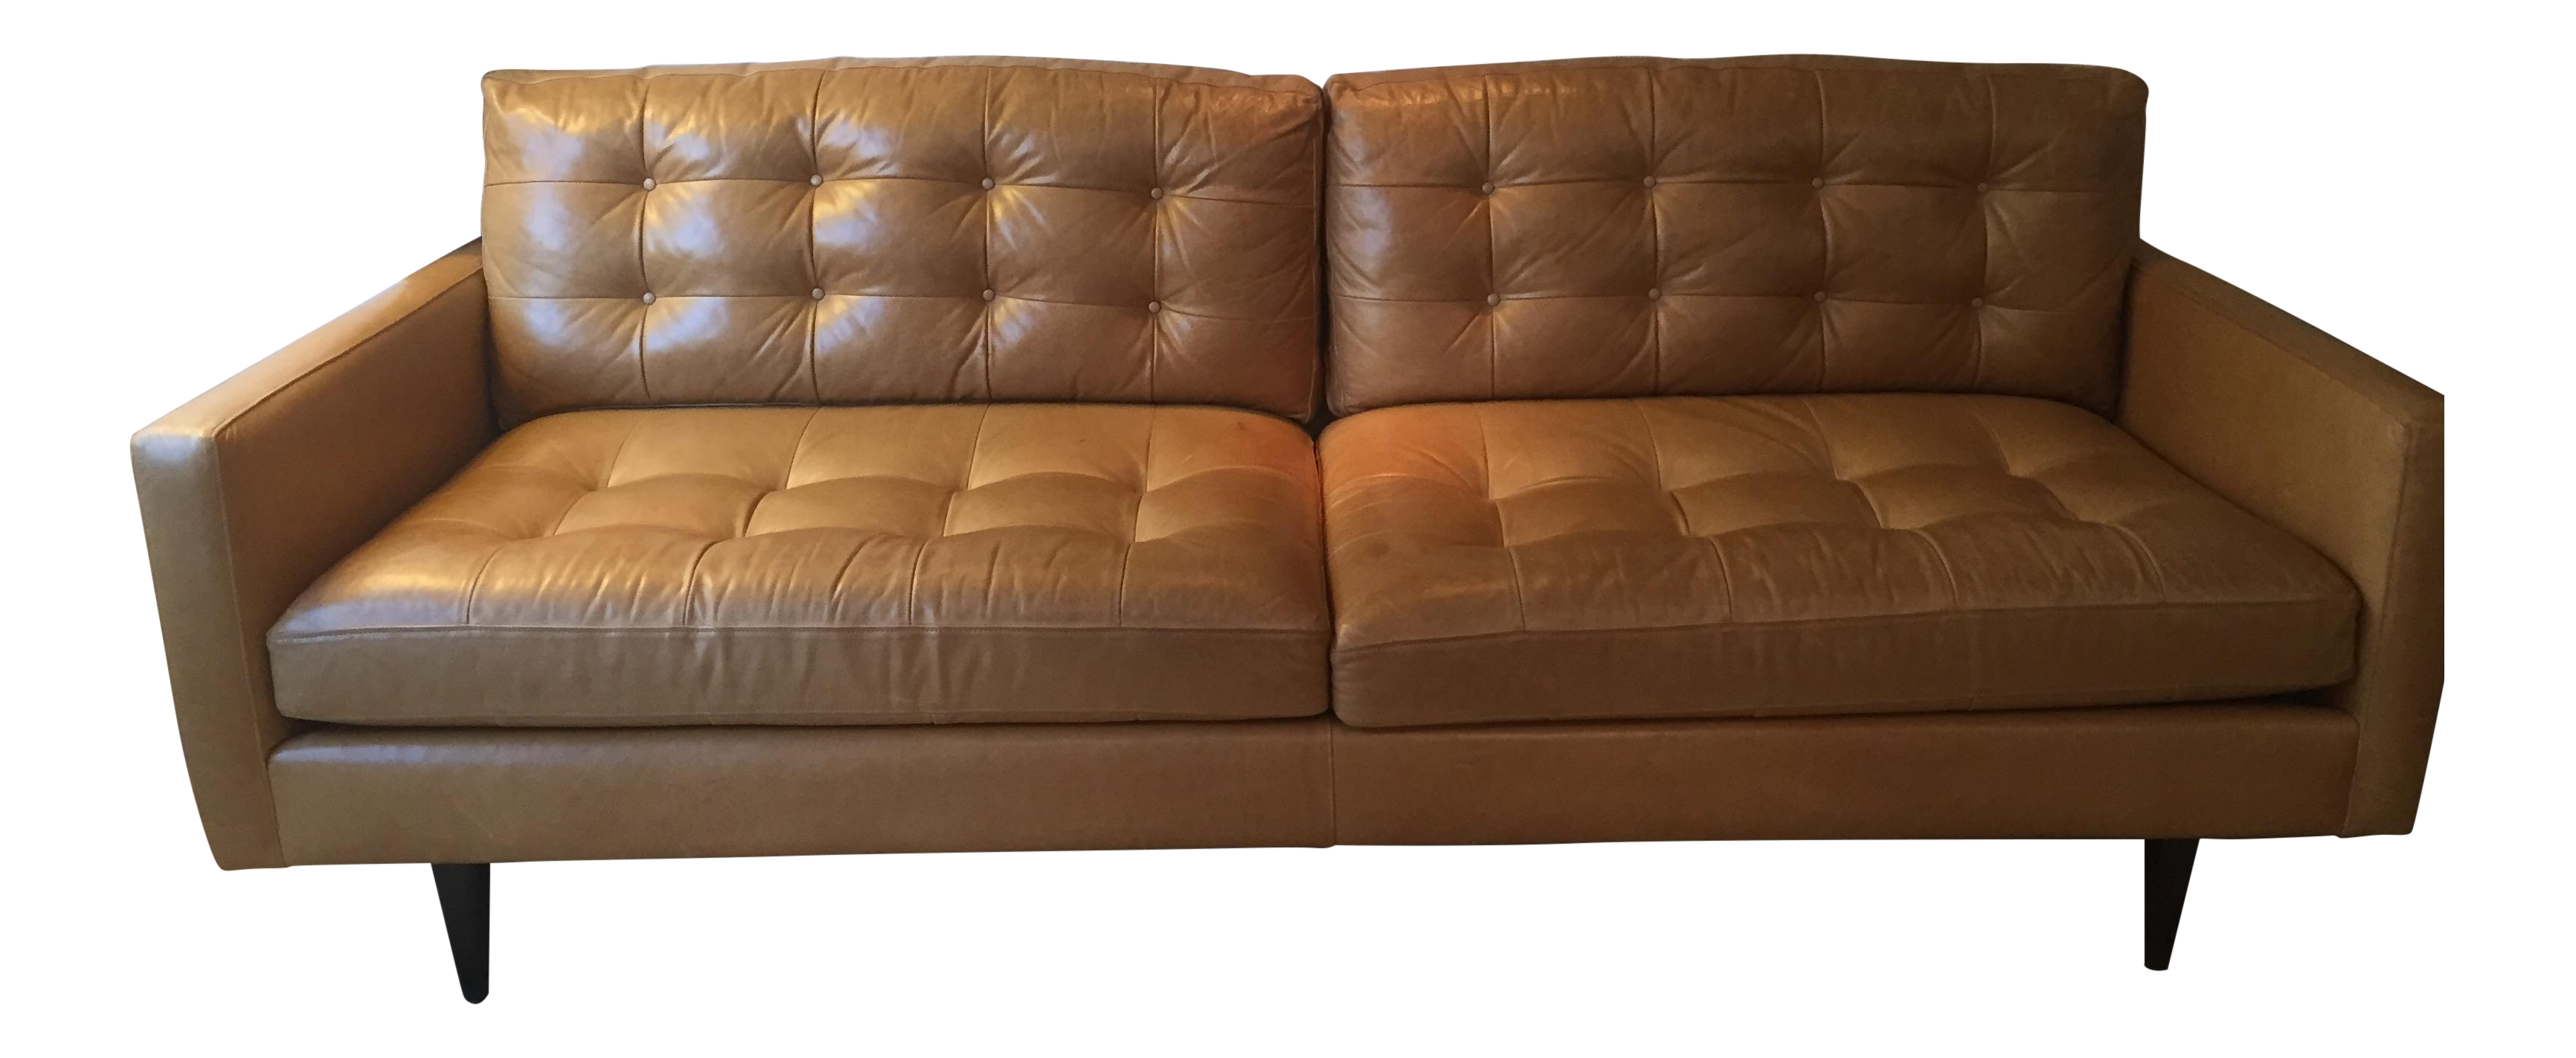 Crate barrel petrie leather sofa chairish